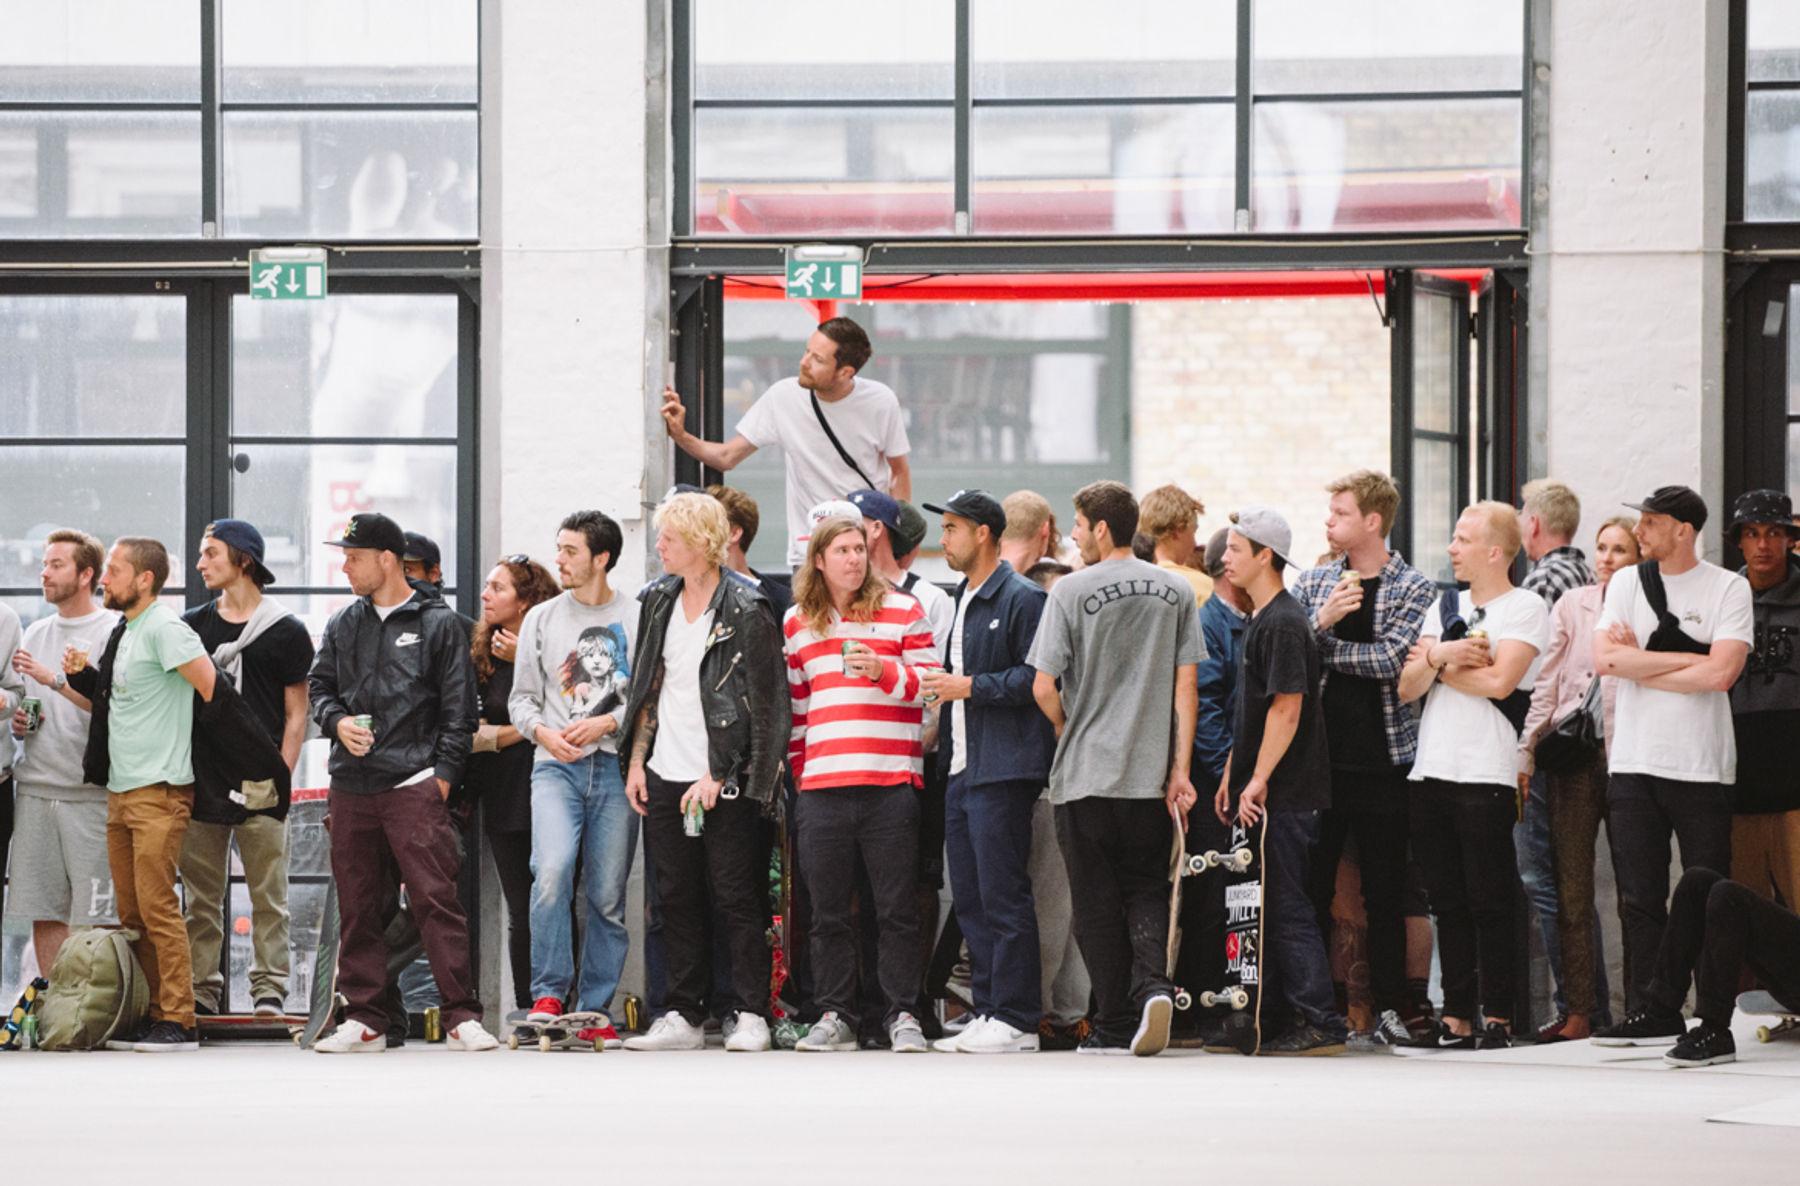 _IHC4658e-Nike-SB-Copenhagen-Open-Day-3-July-2015-Photographer-Maksim-Kalanep